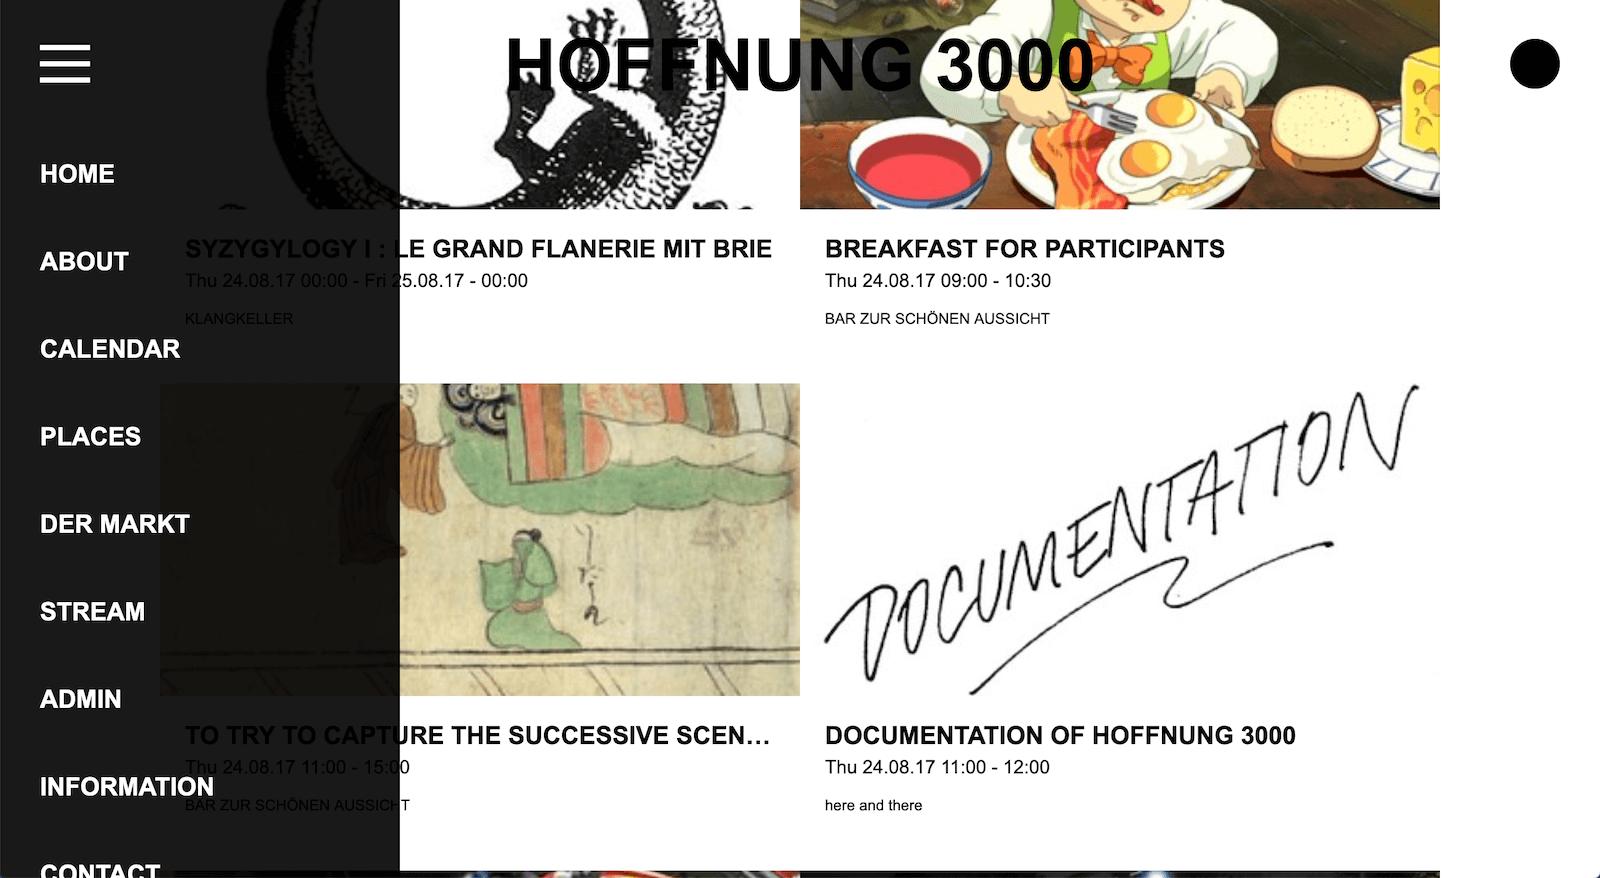 HOFFNUNG 3000